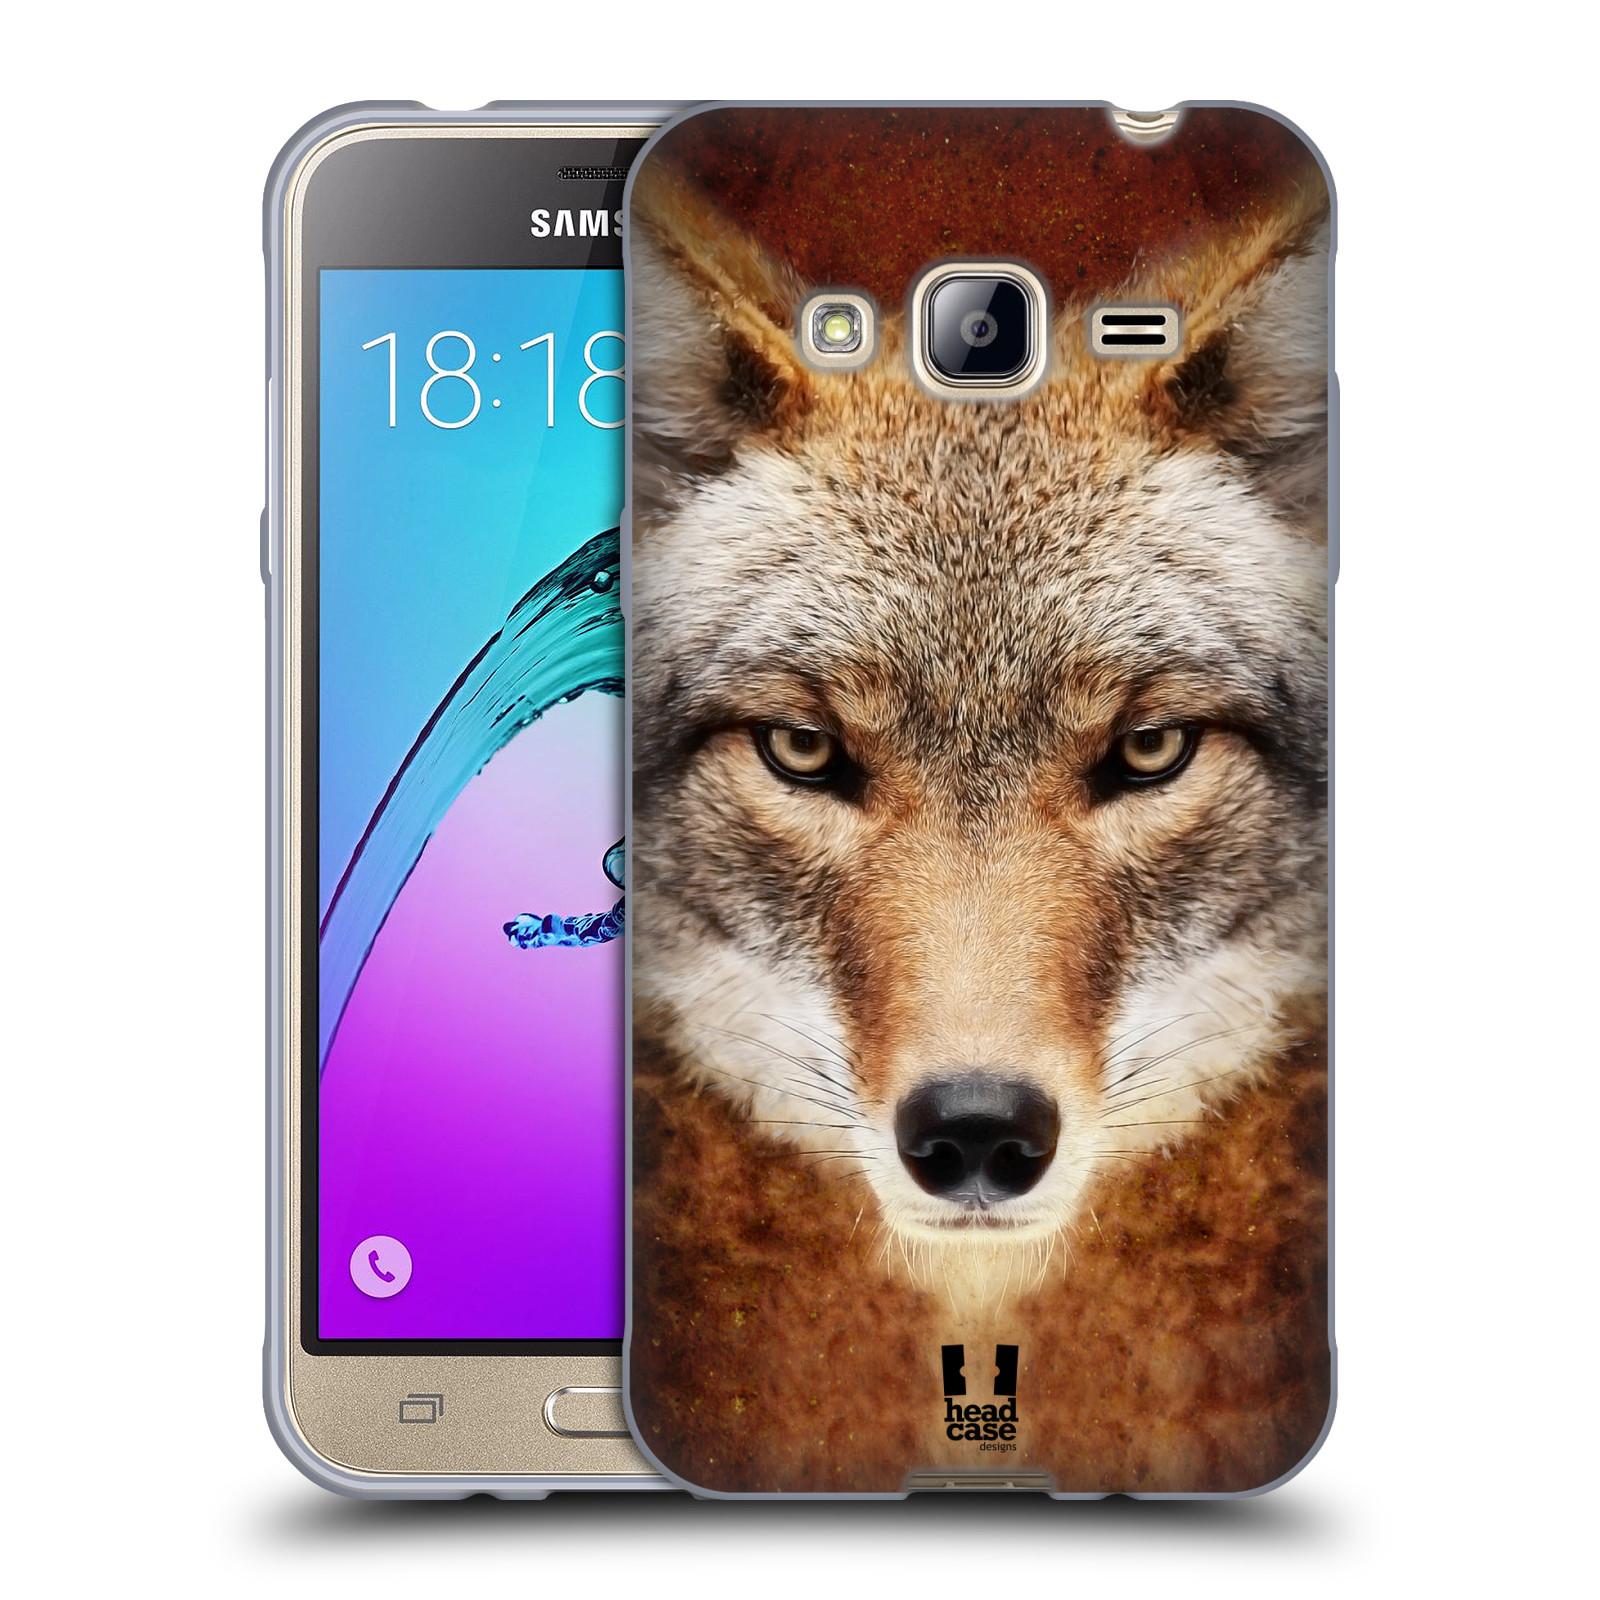 HEAD CASE silikonový obal na mobil Samsung Galaxy J3, J3 2016 vzor Zvířecí tváře kojot